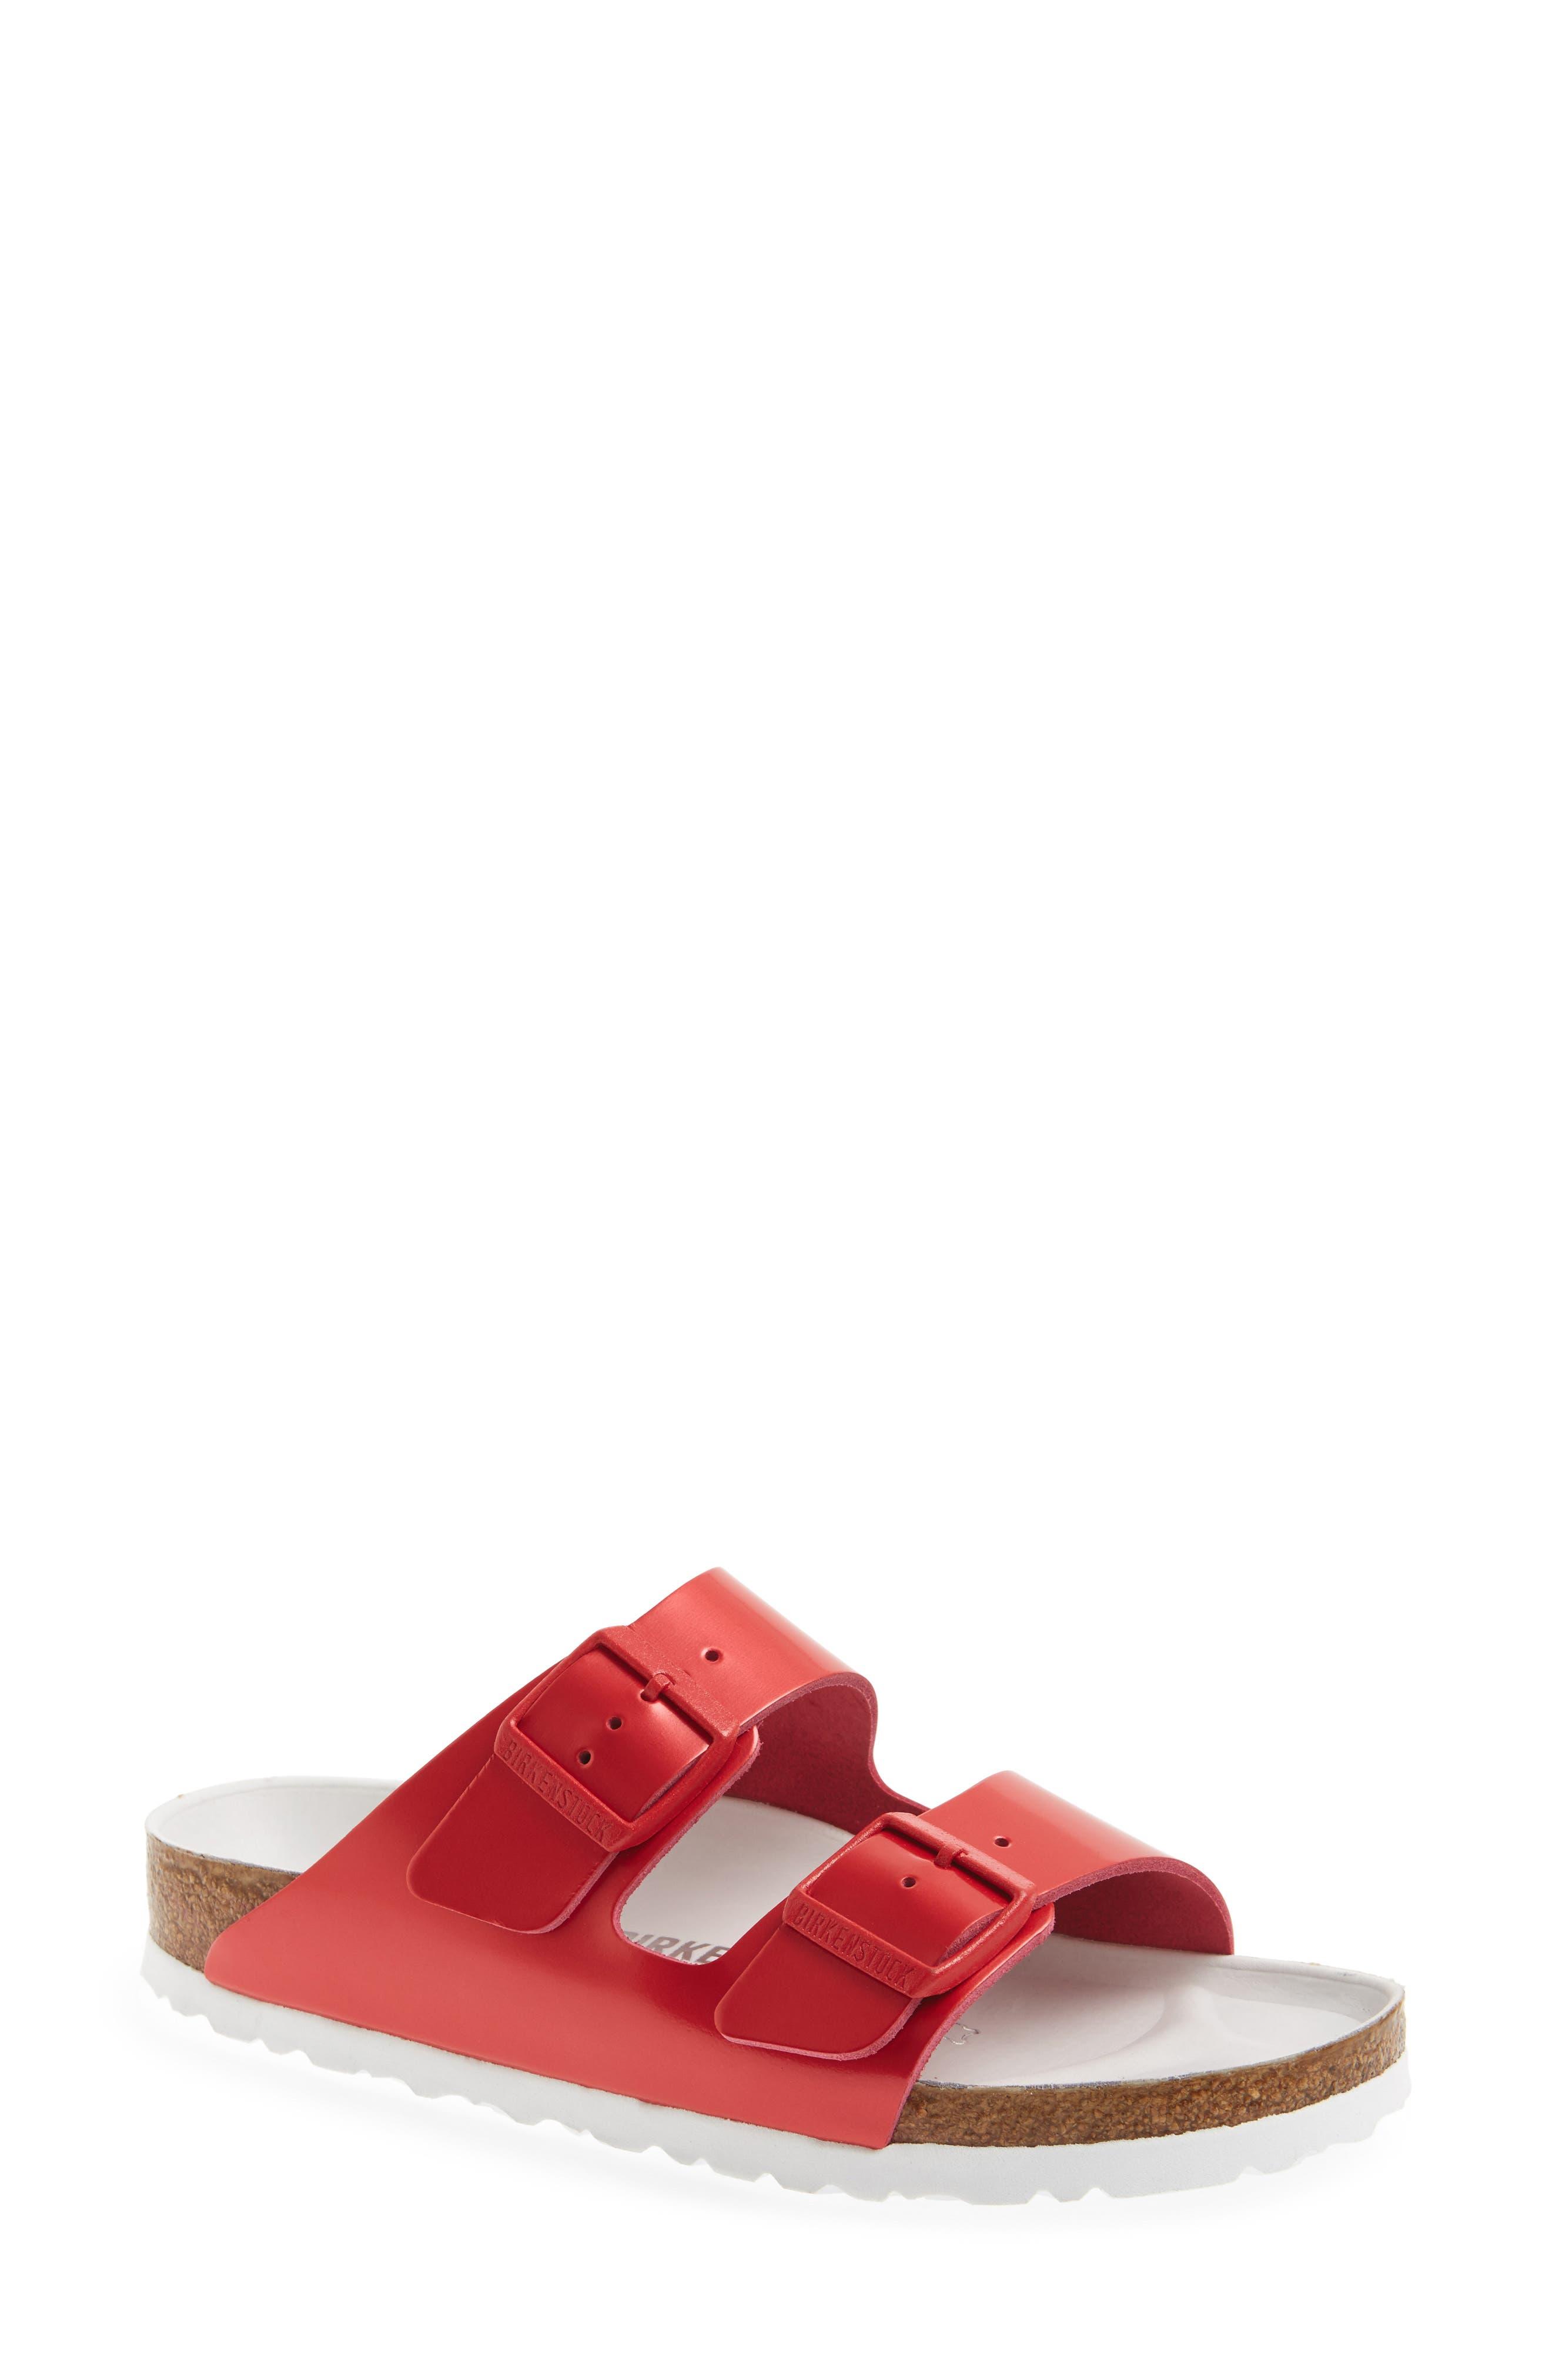 Birkenstock Arizona Hex Limited Edition   Shock Drop Slide Sandal (Women)